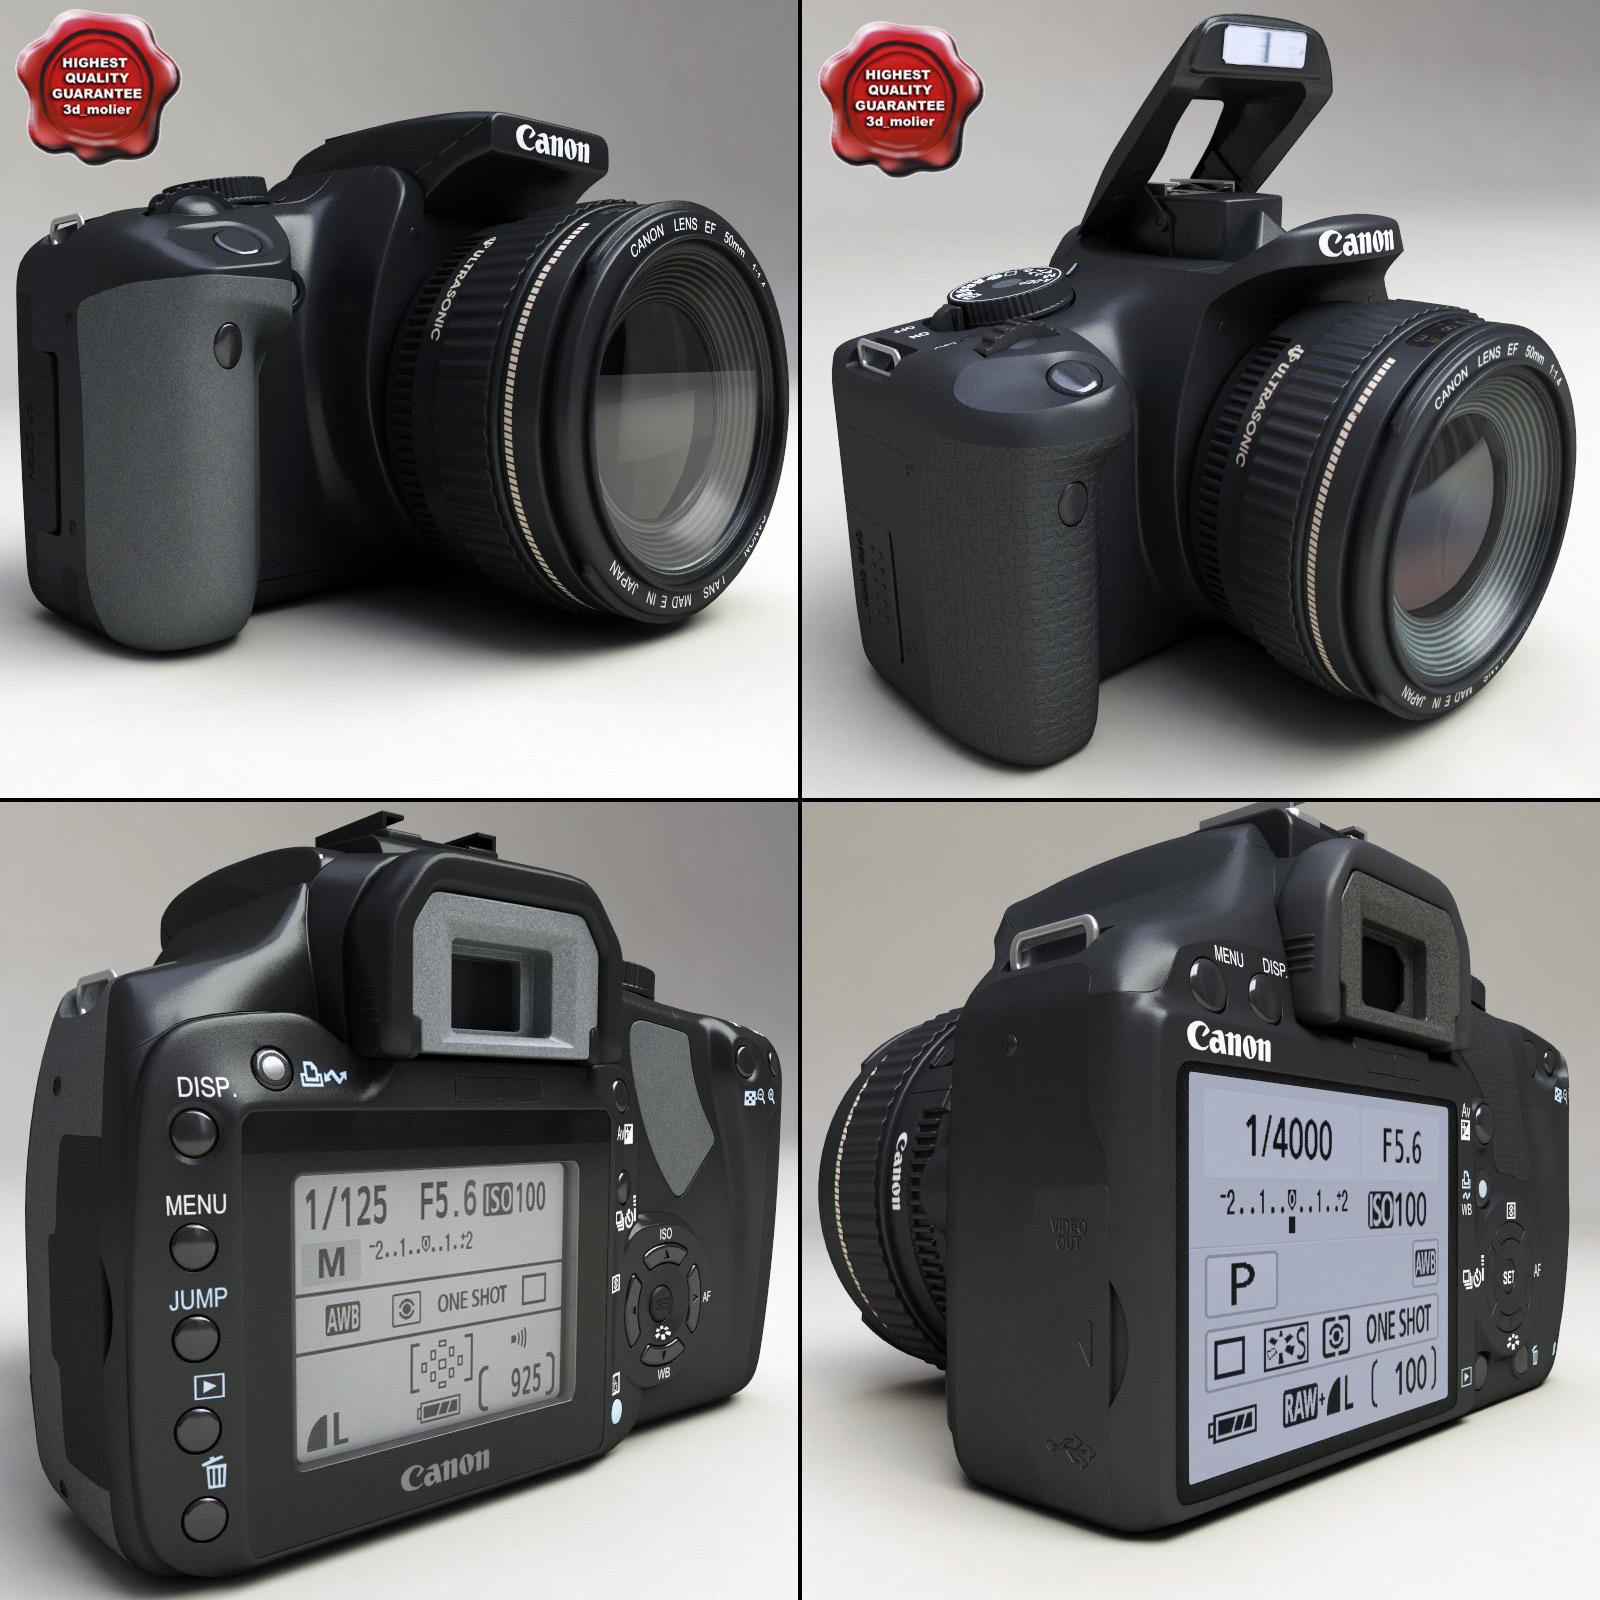 Canon_EOS_400D_and_Canon_EOS_450D_00.jpg